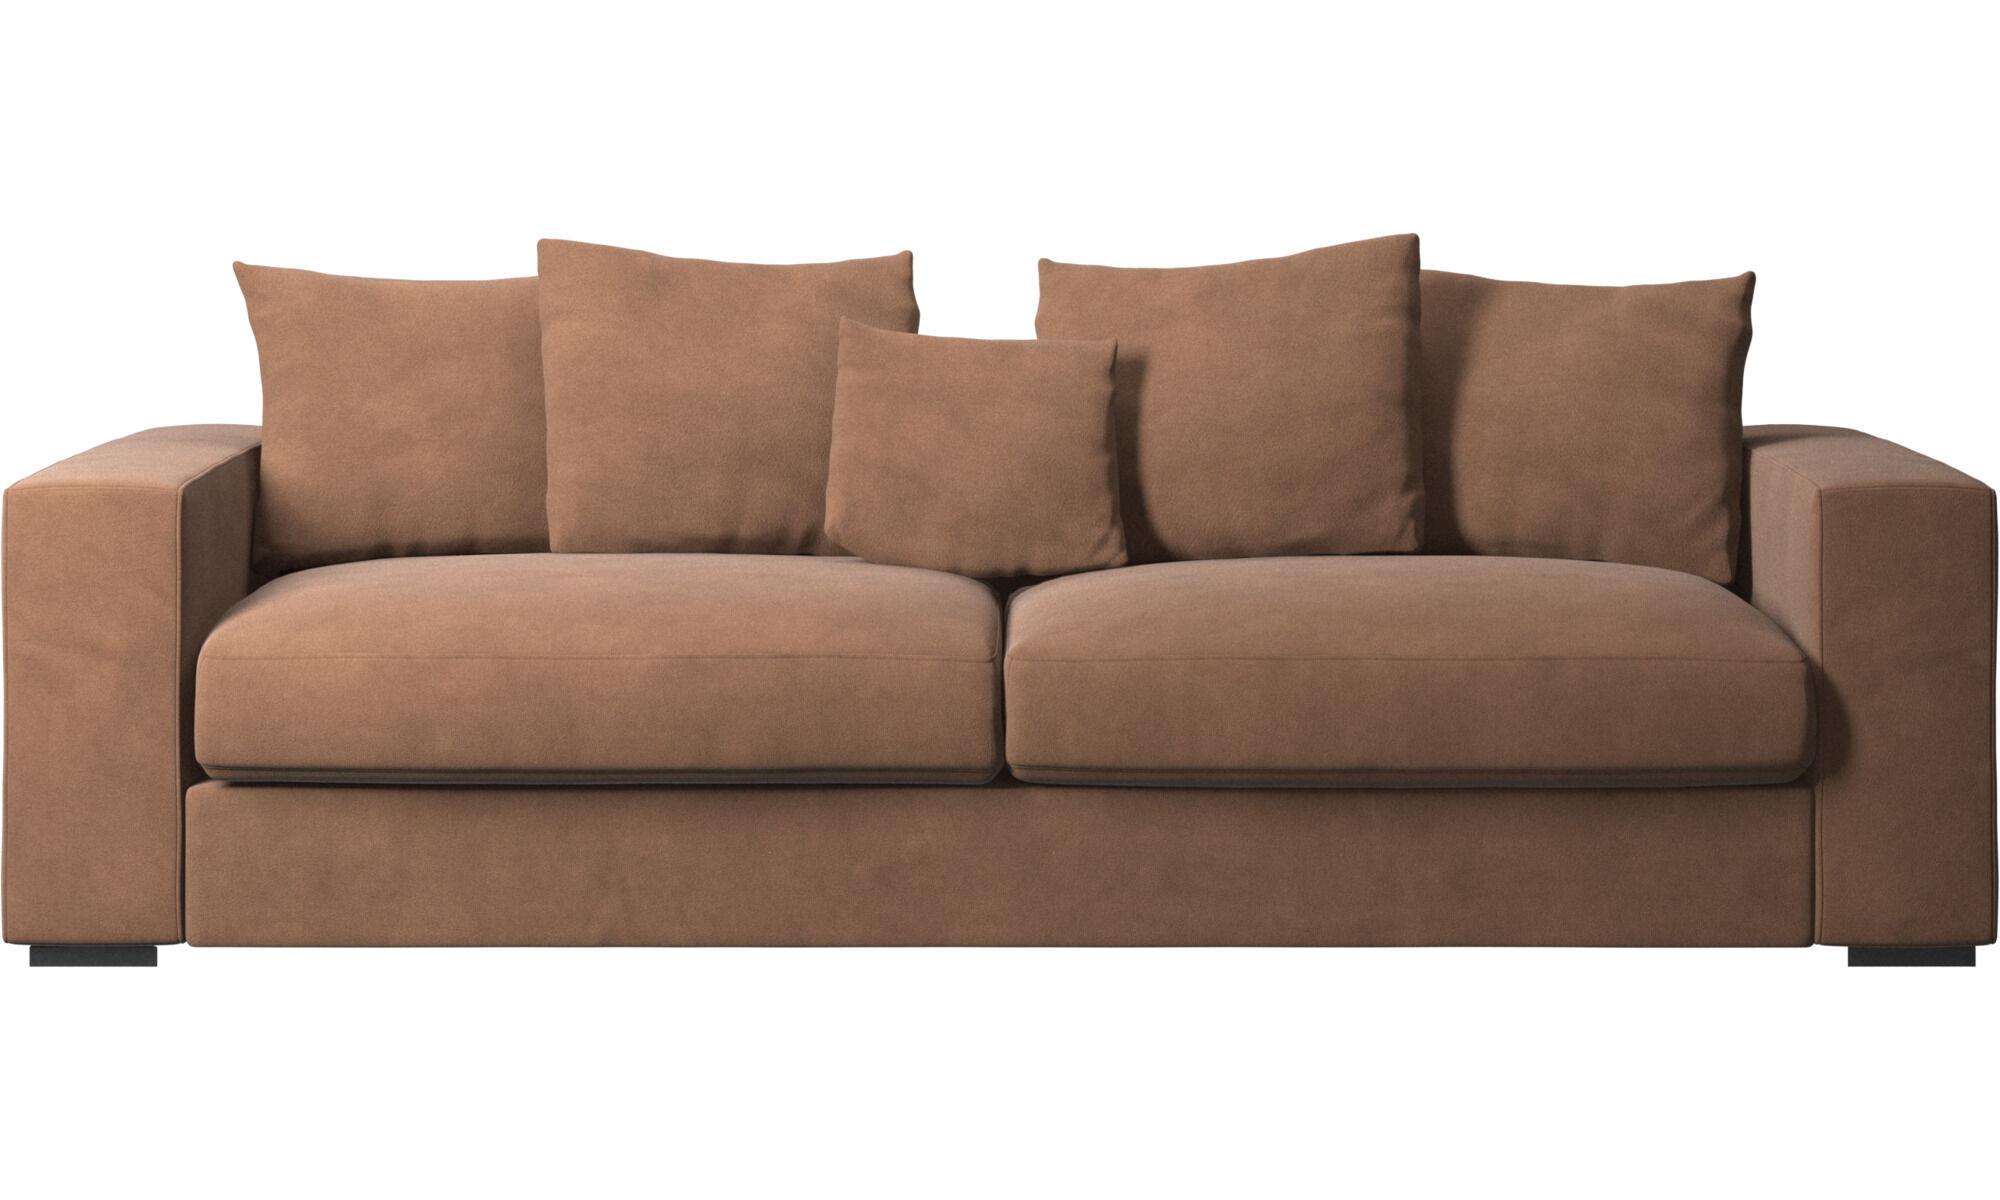 Great 3 Seater Sofas   Cenova Sofa   Brown   Fabric